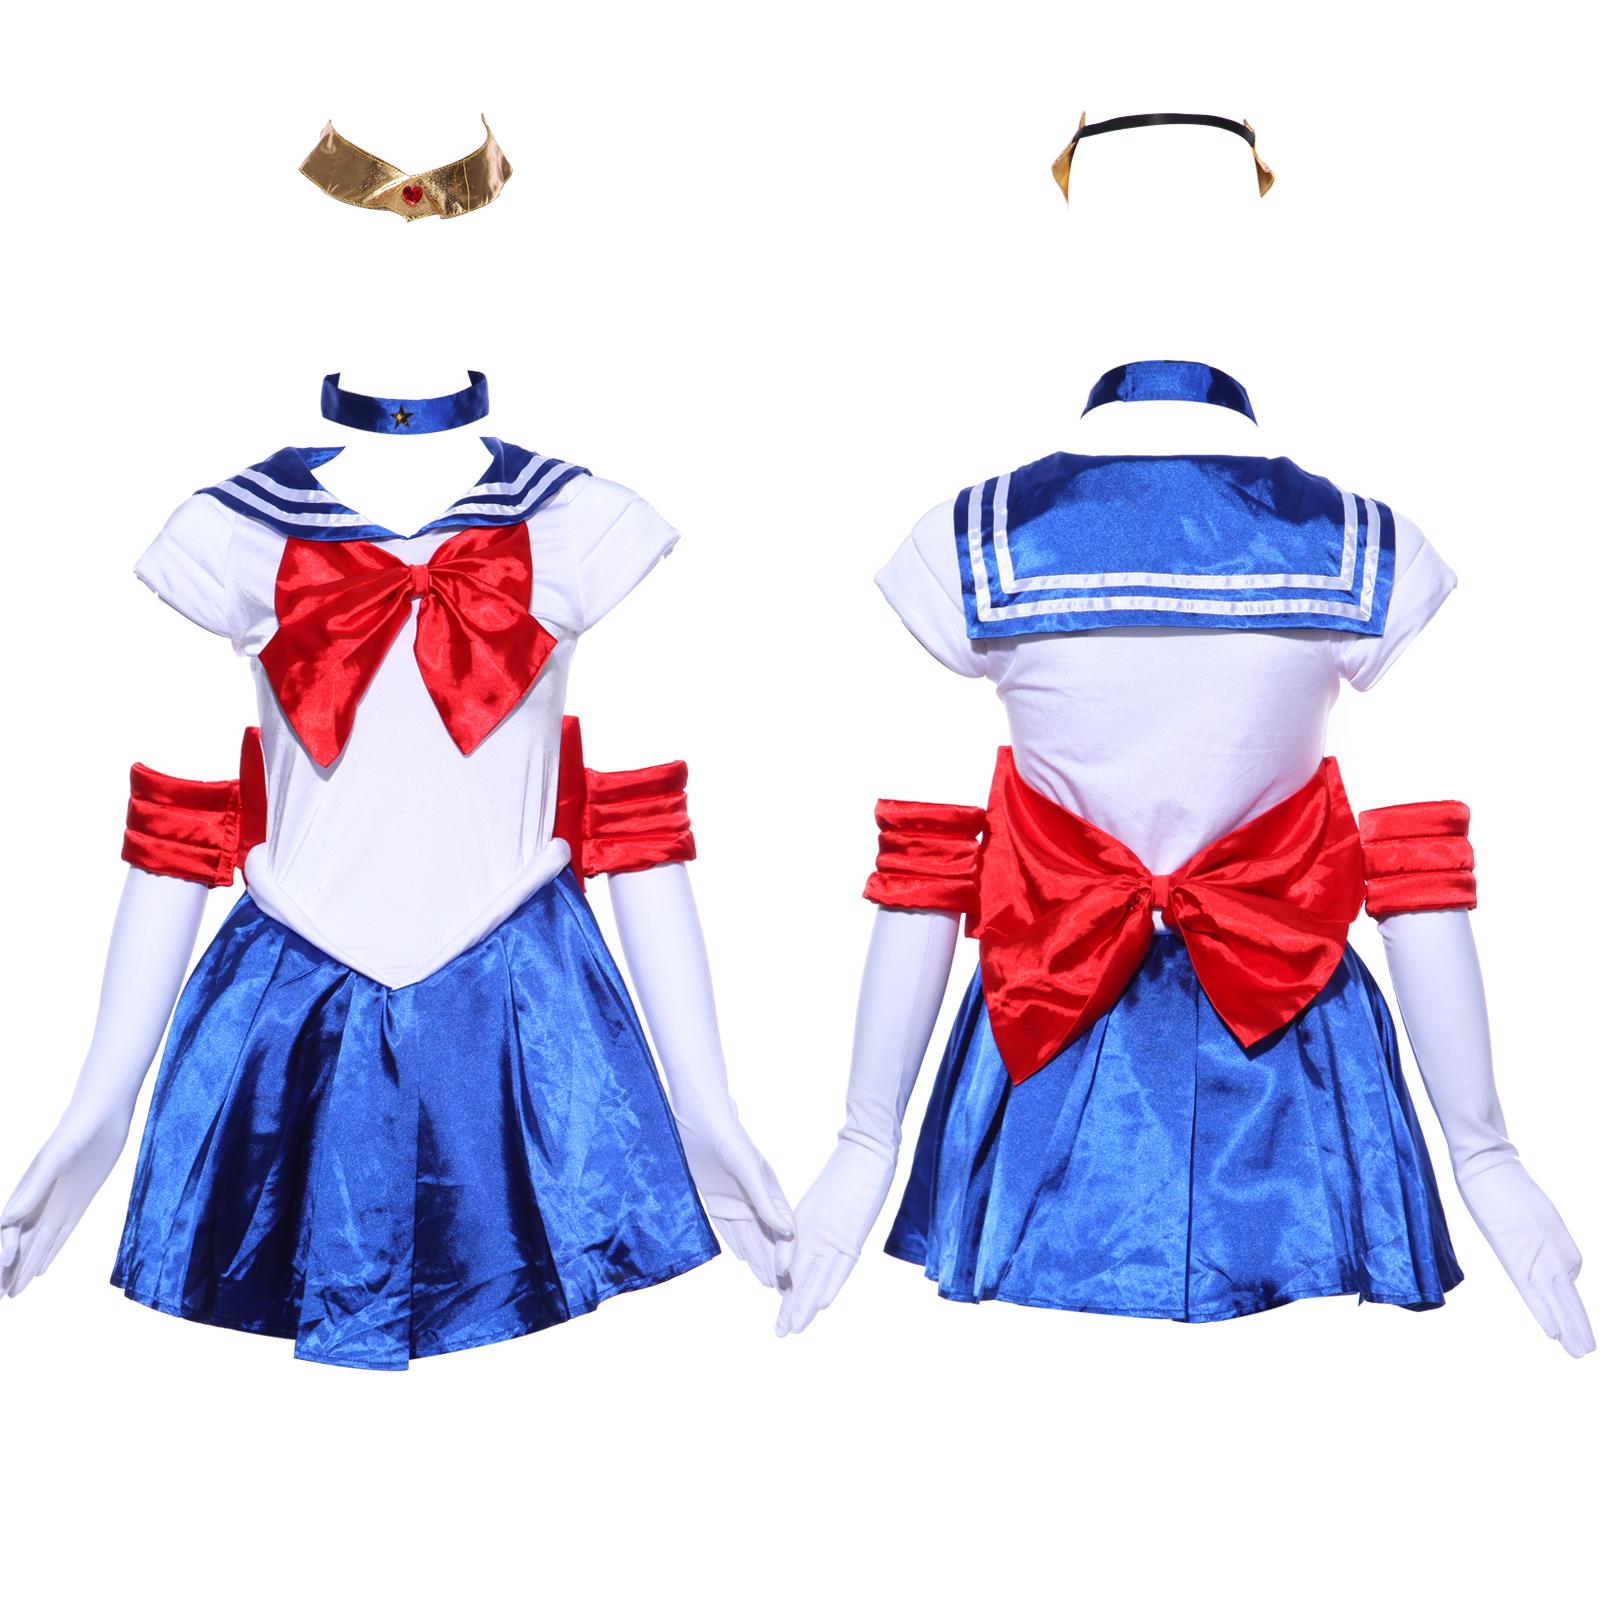 sailor moon costume serena cosplay anime uniform fancy. Black Bedroom Furniture Sets. Home Design Ideas